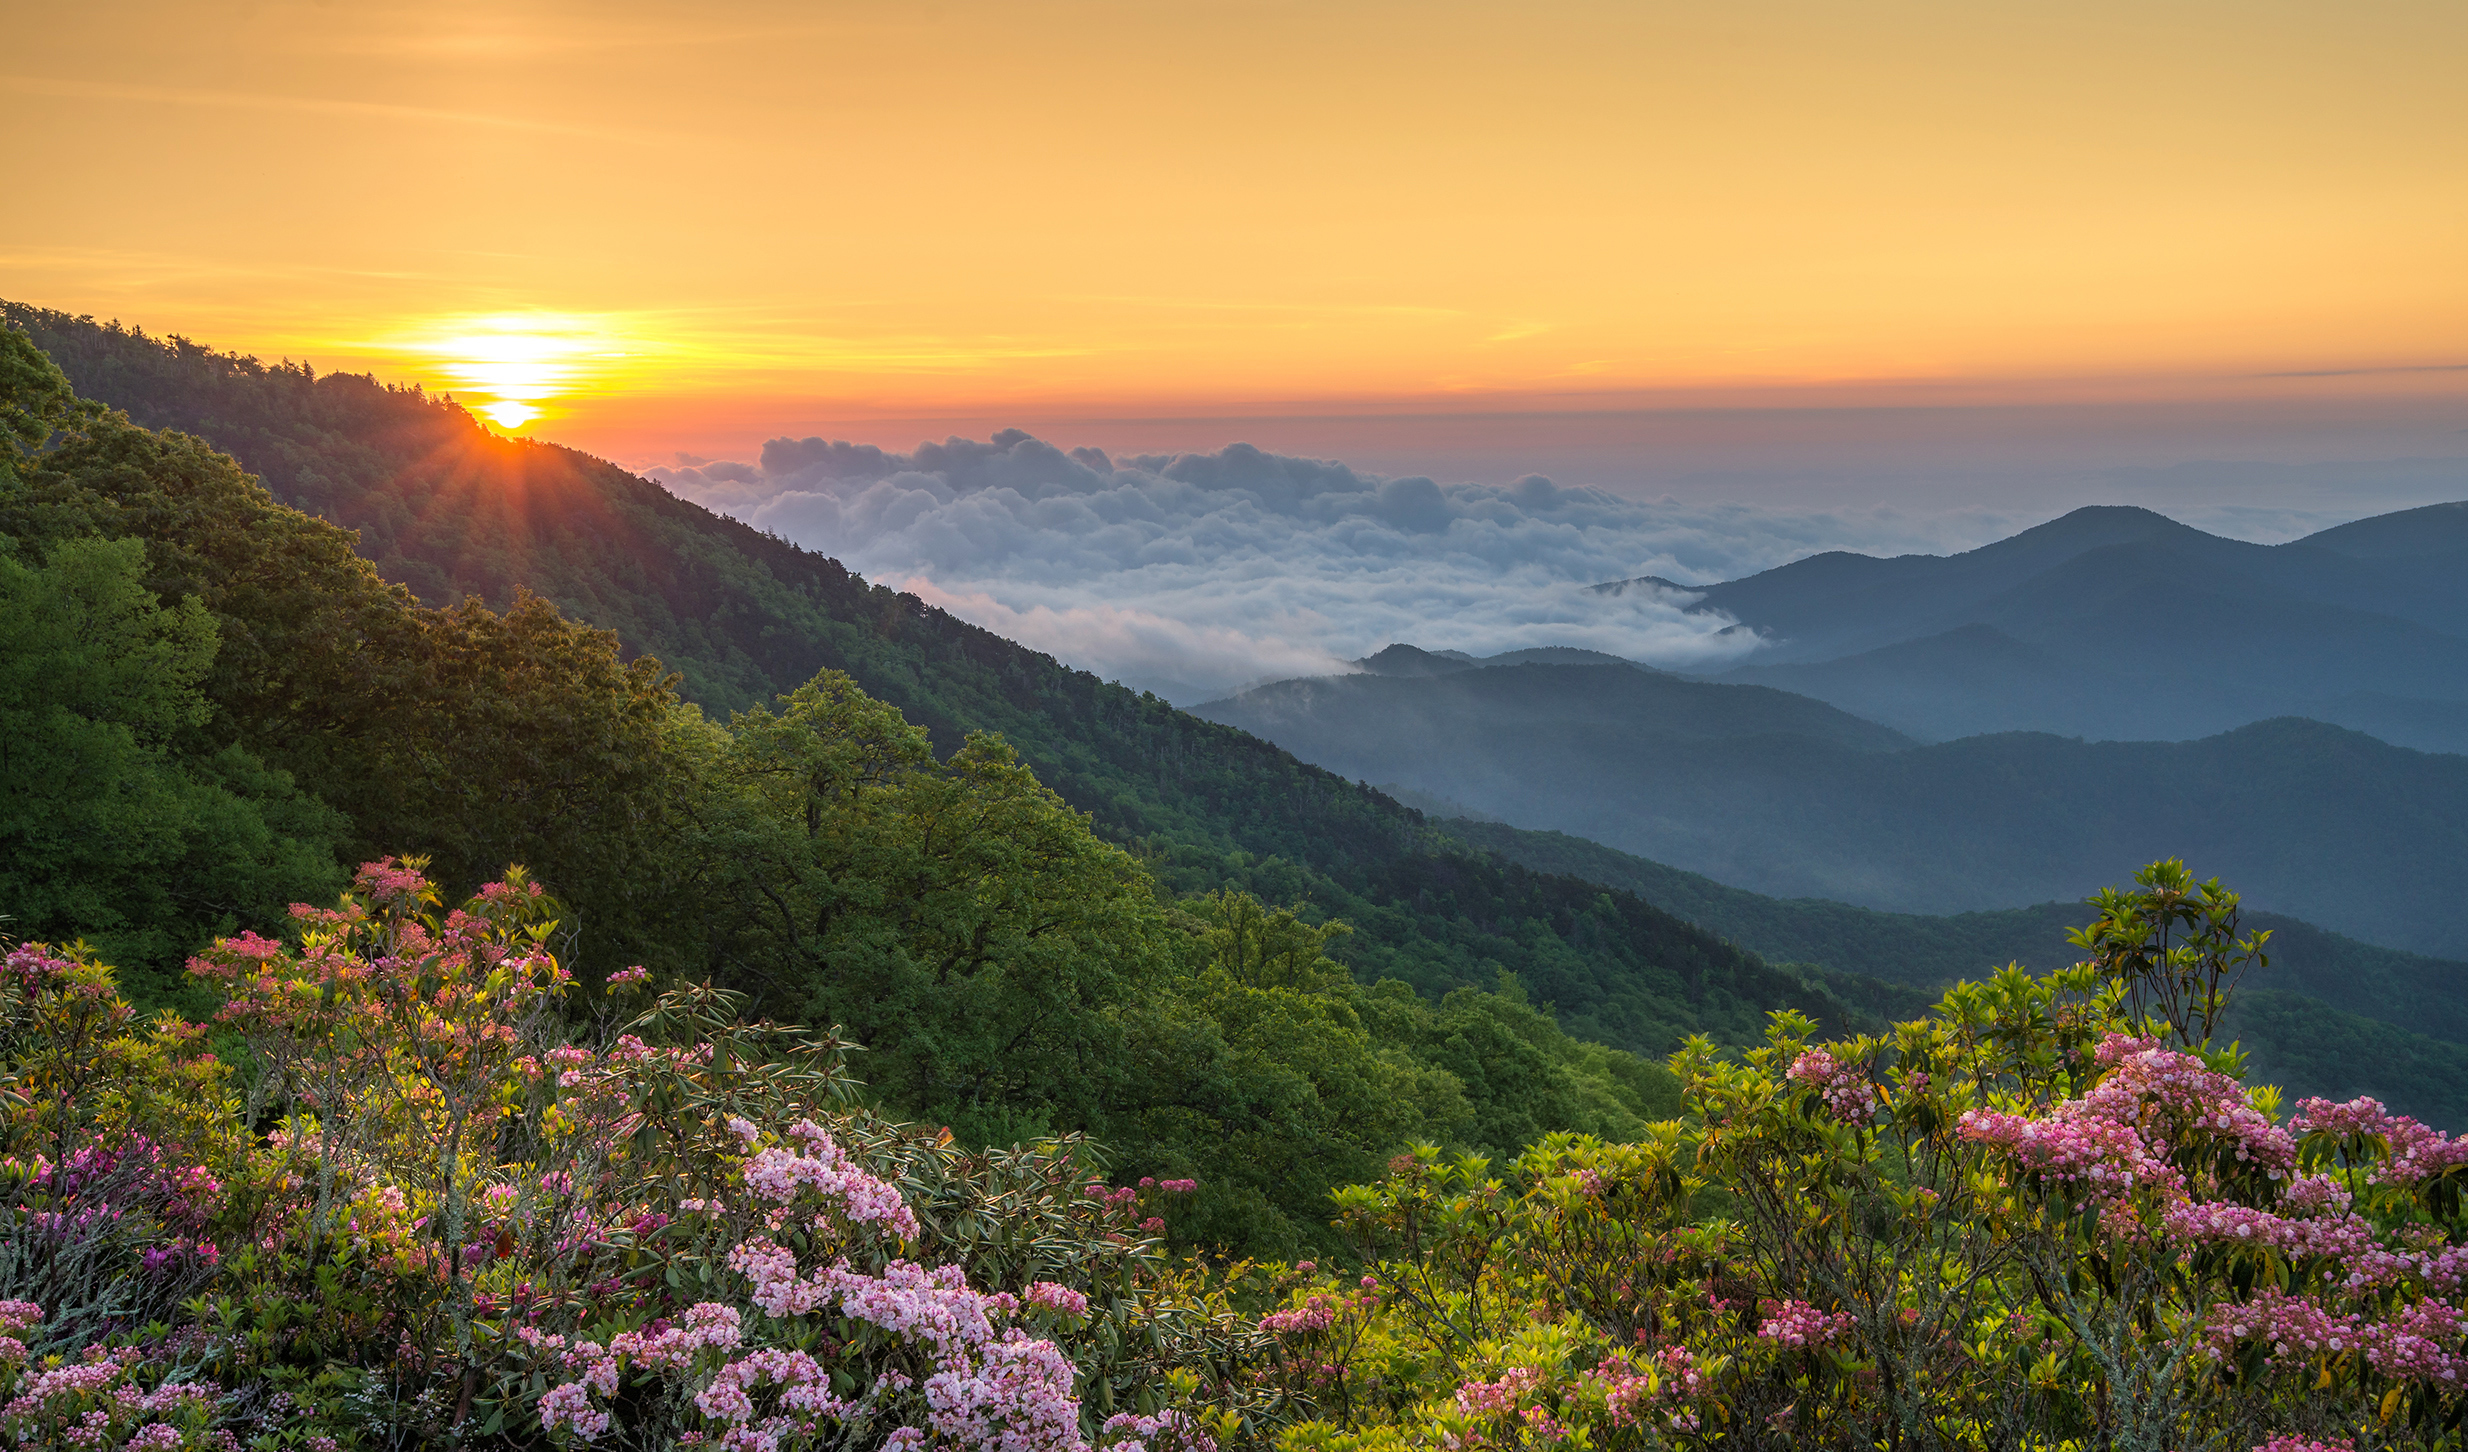 Image of North Carolina